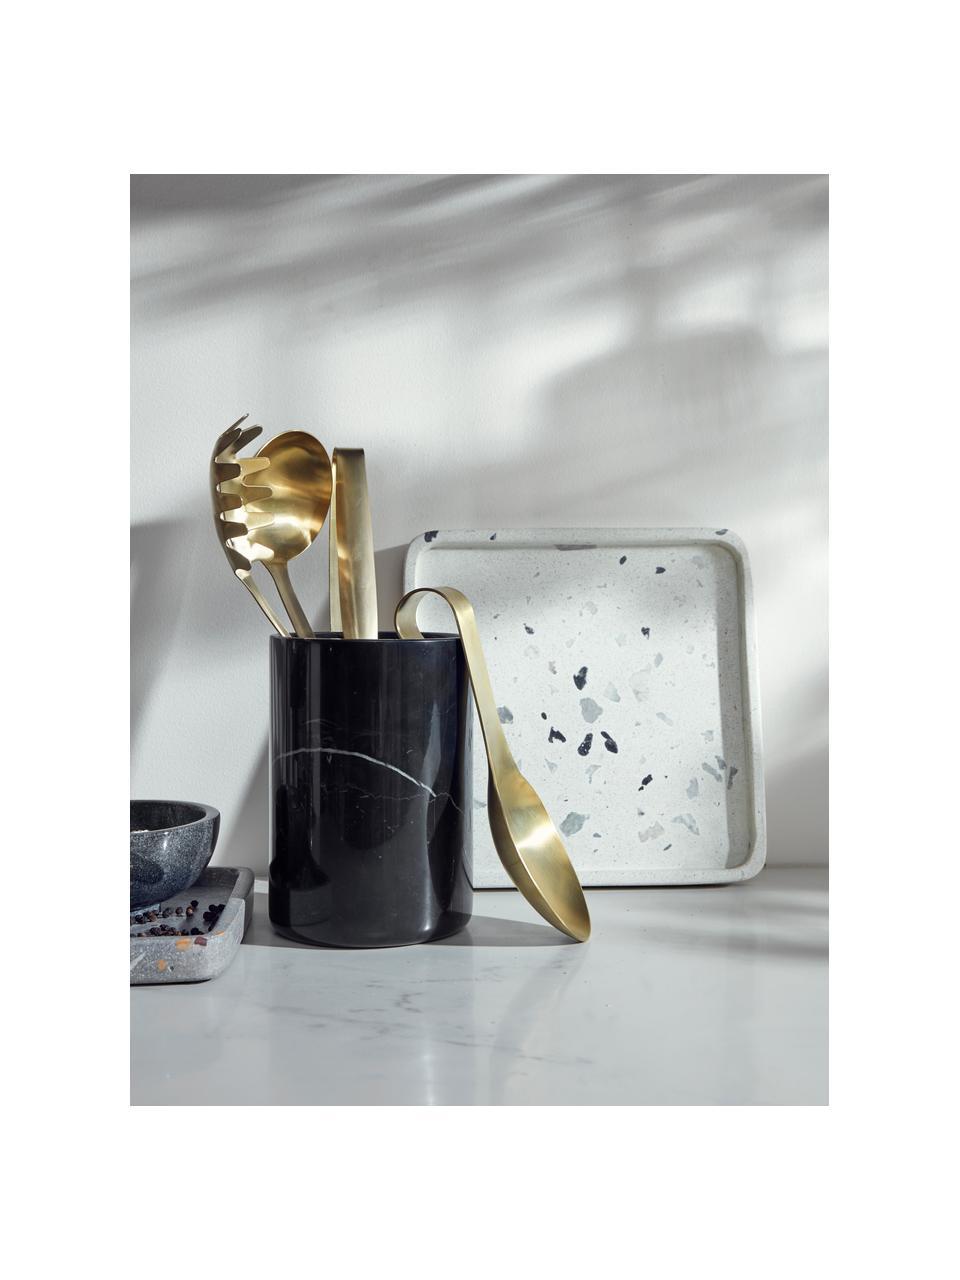 Schöpfkelle Goldies in mattem Gold, Edelstahl, beschichtet, Messingfarben, matt, 6 x 32 cm